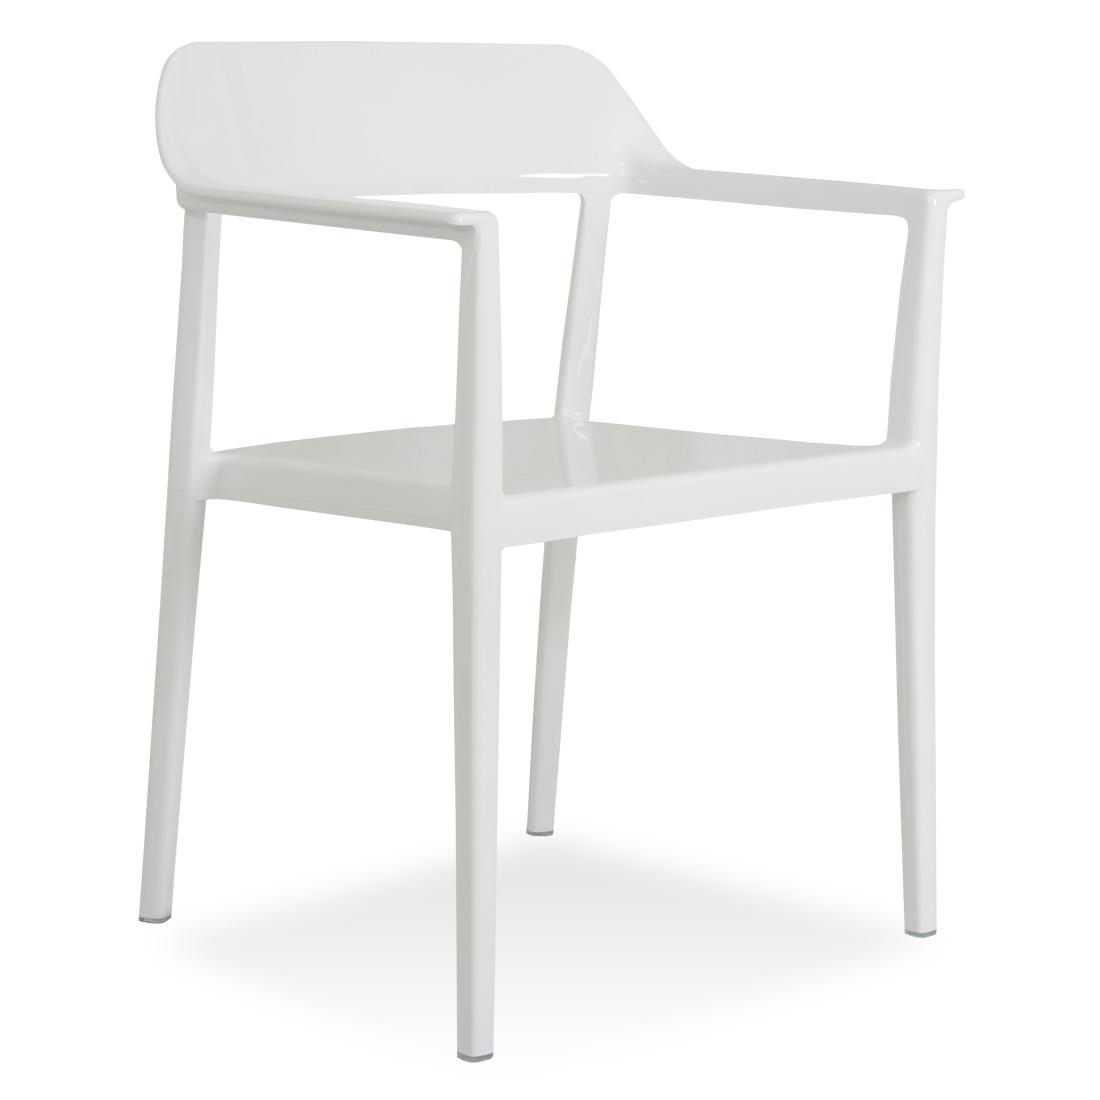 studio copenhagen stuhl geppetto vom niederl ndischen designer danny fang foto mit. Black Bedroom Furniture Sets. Home Design Ideas